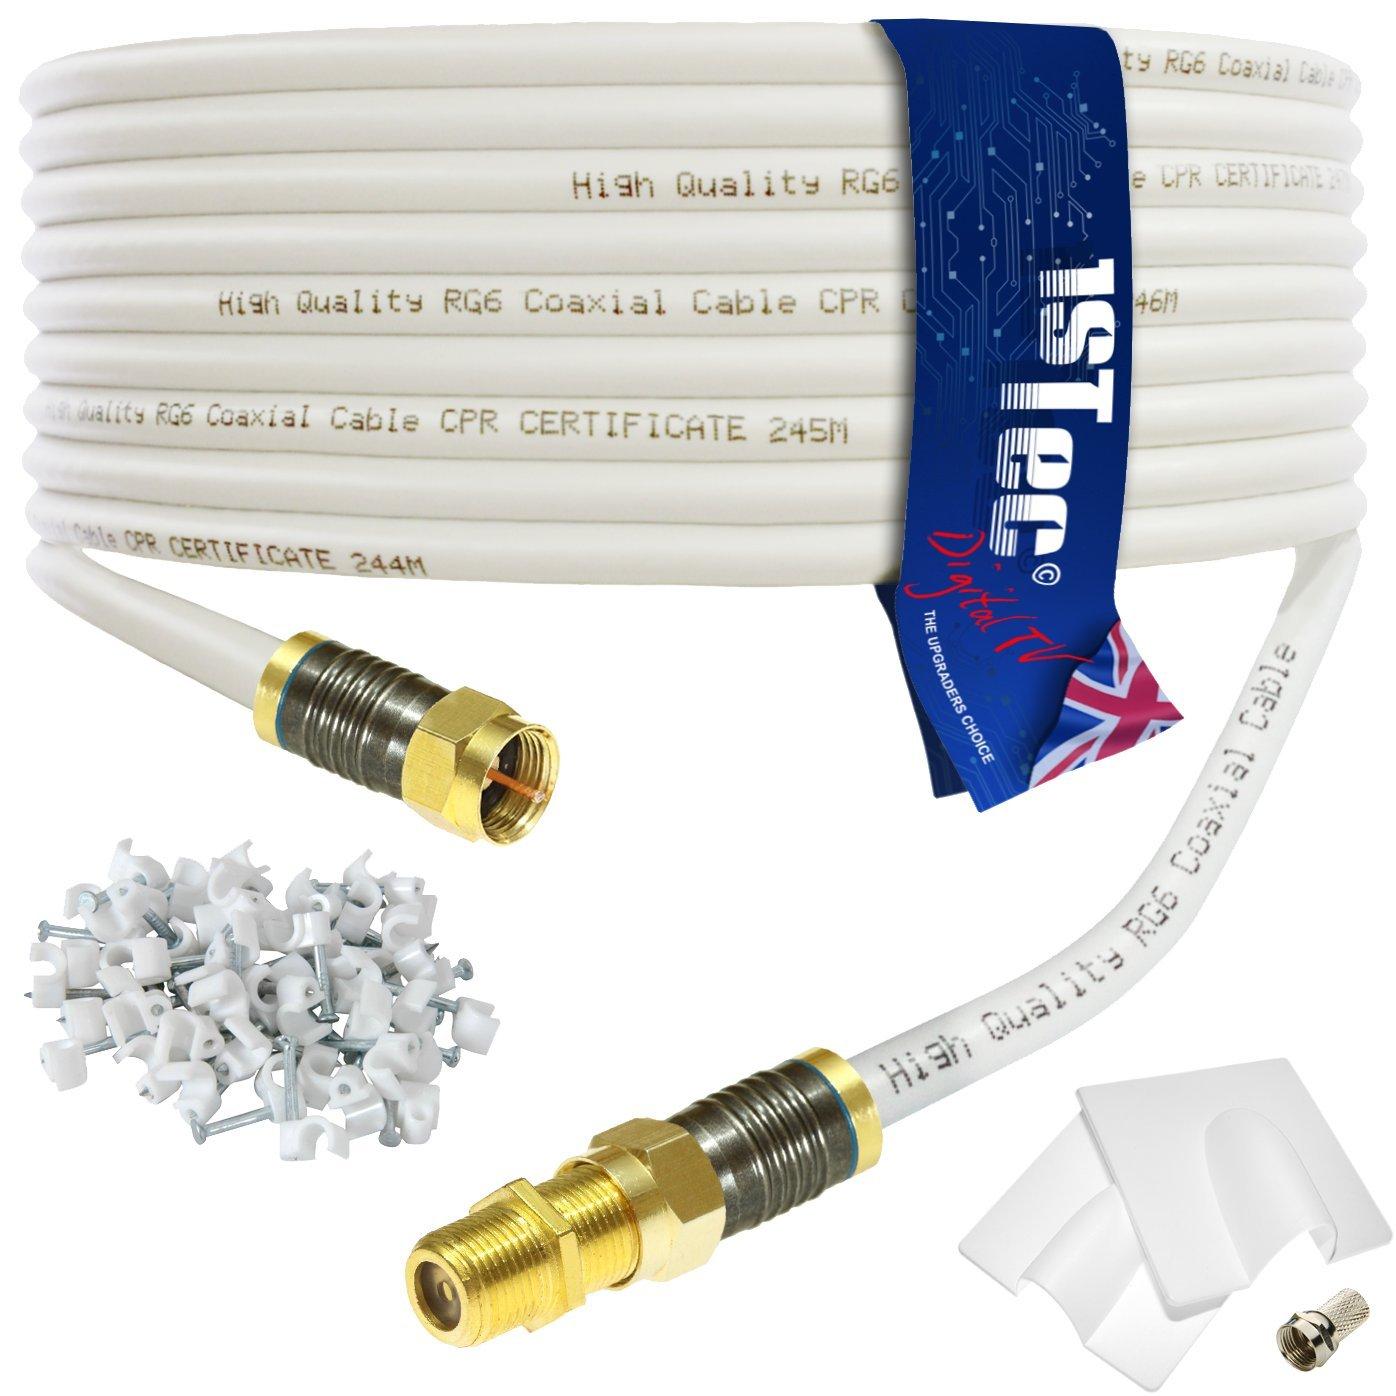 Cable de extensión para televisión Virgin o banda ancha digital de 1STec 30 Metre blanco: Amazon.es: Electrónica